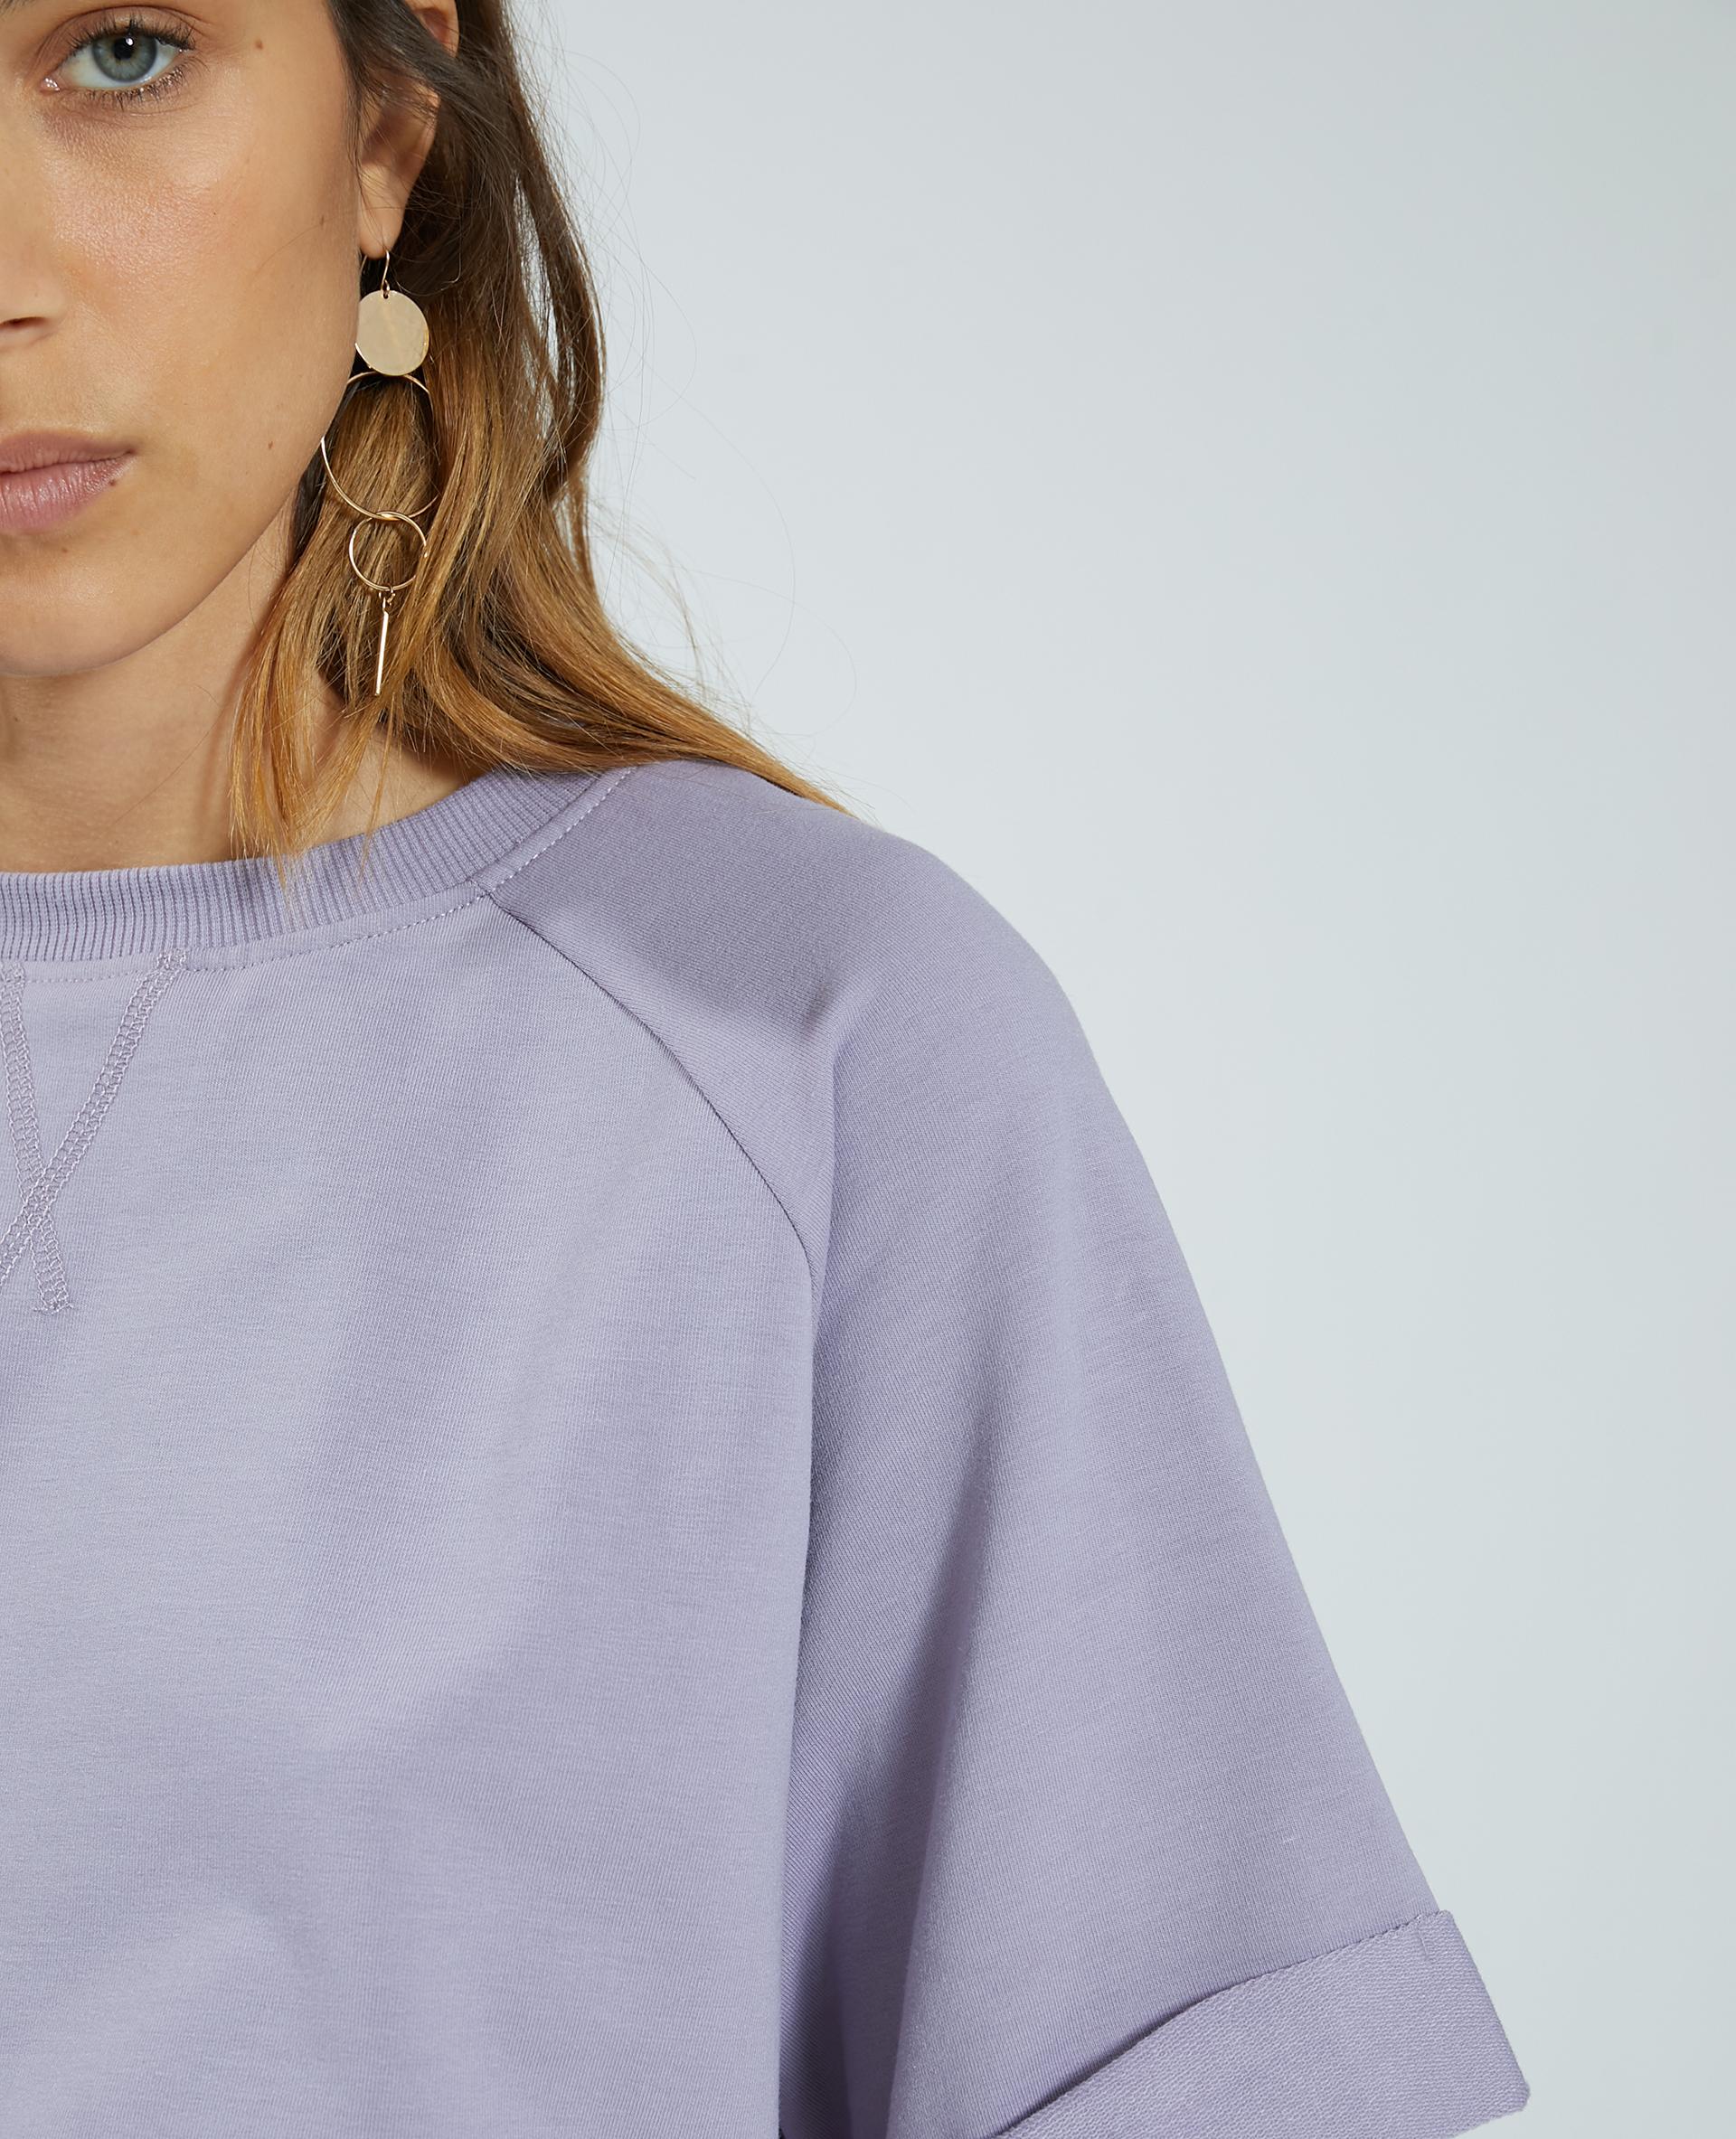 Felpa maniche corte viola - Pimkie